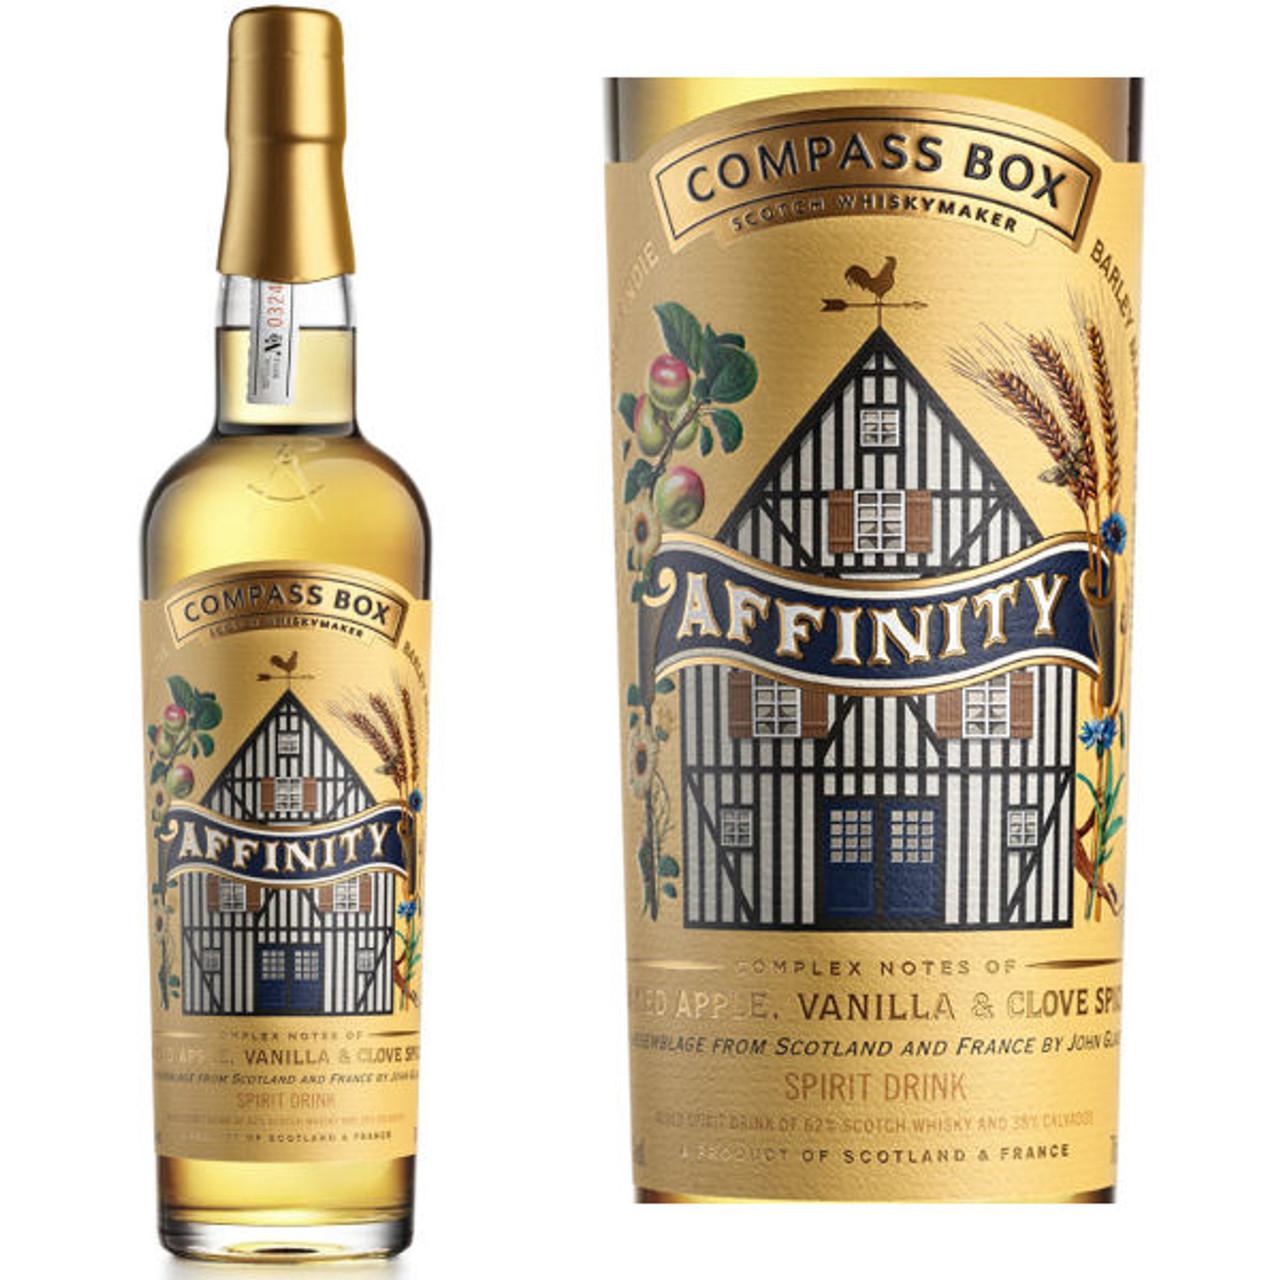 Compass Box Affinity Spirit Drink 750ml